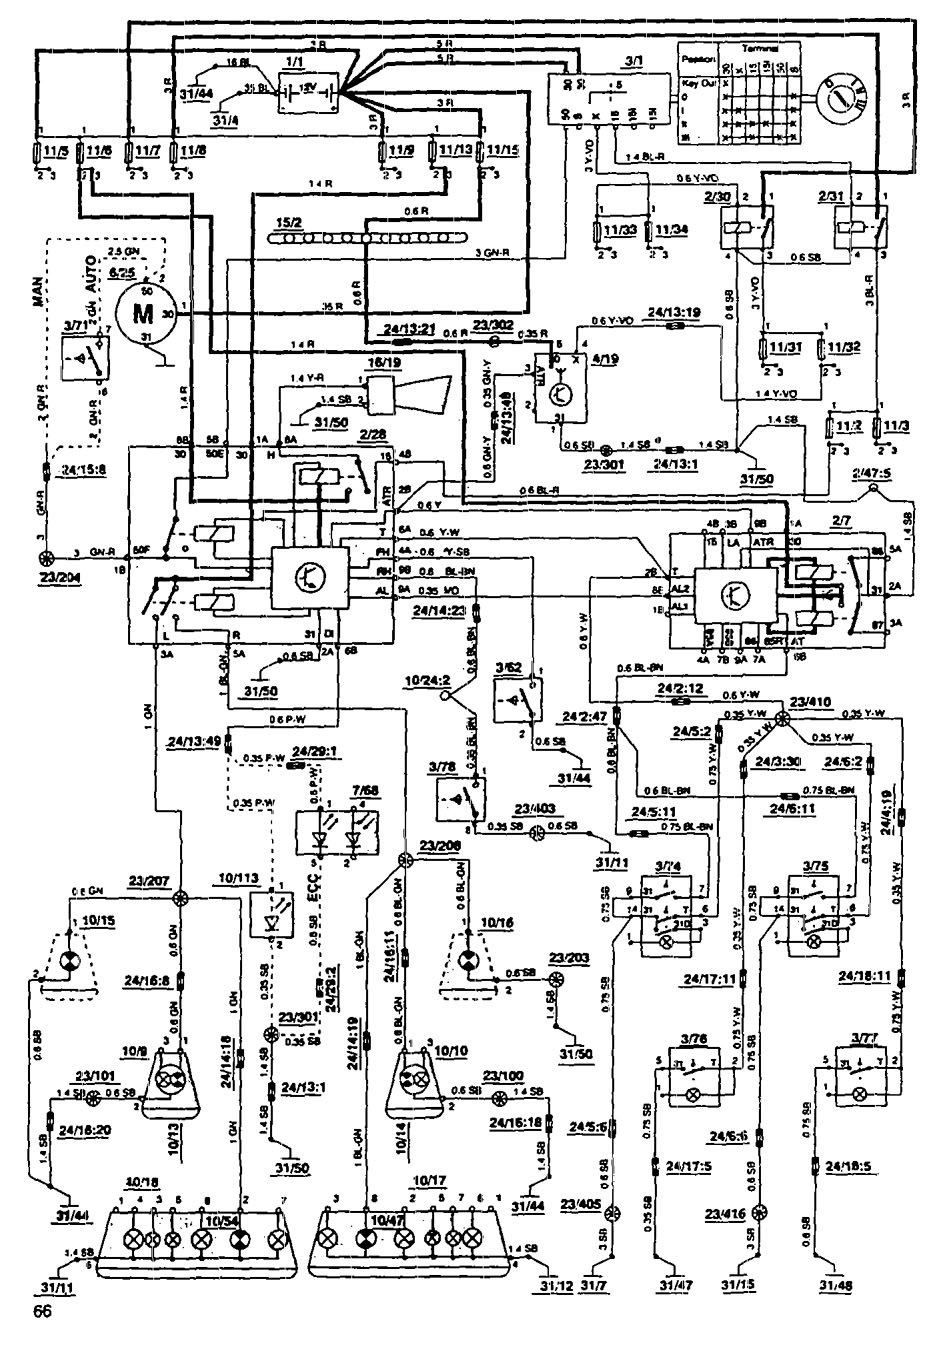 Volvo 940 Radio Wiring Harness 1995 960 Diagram 850 1993 Diagrams Security Anti Theft